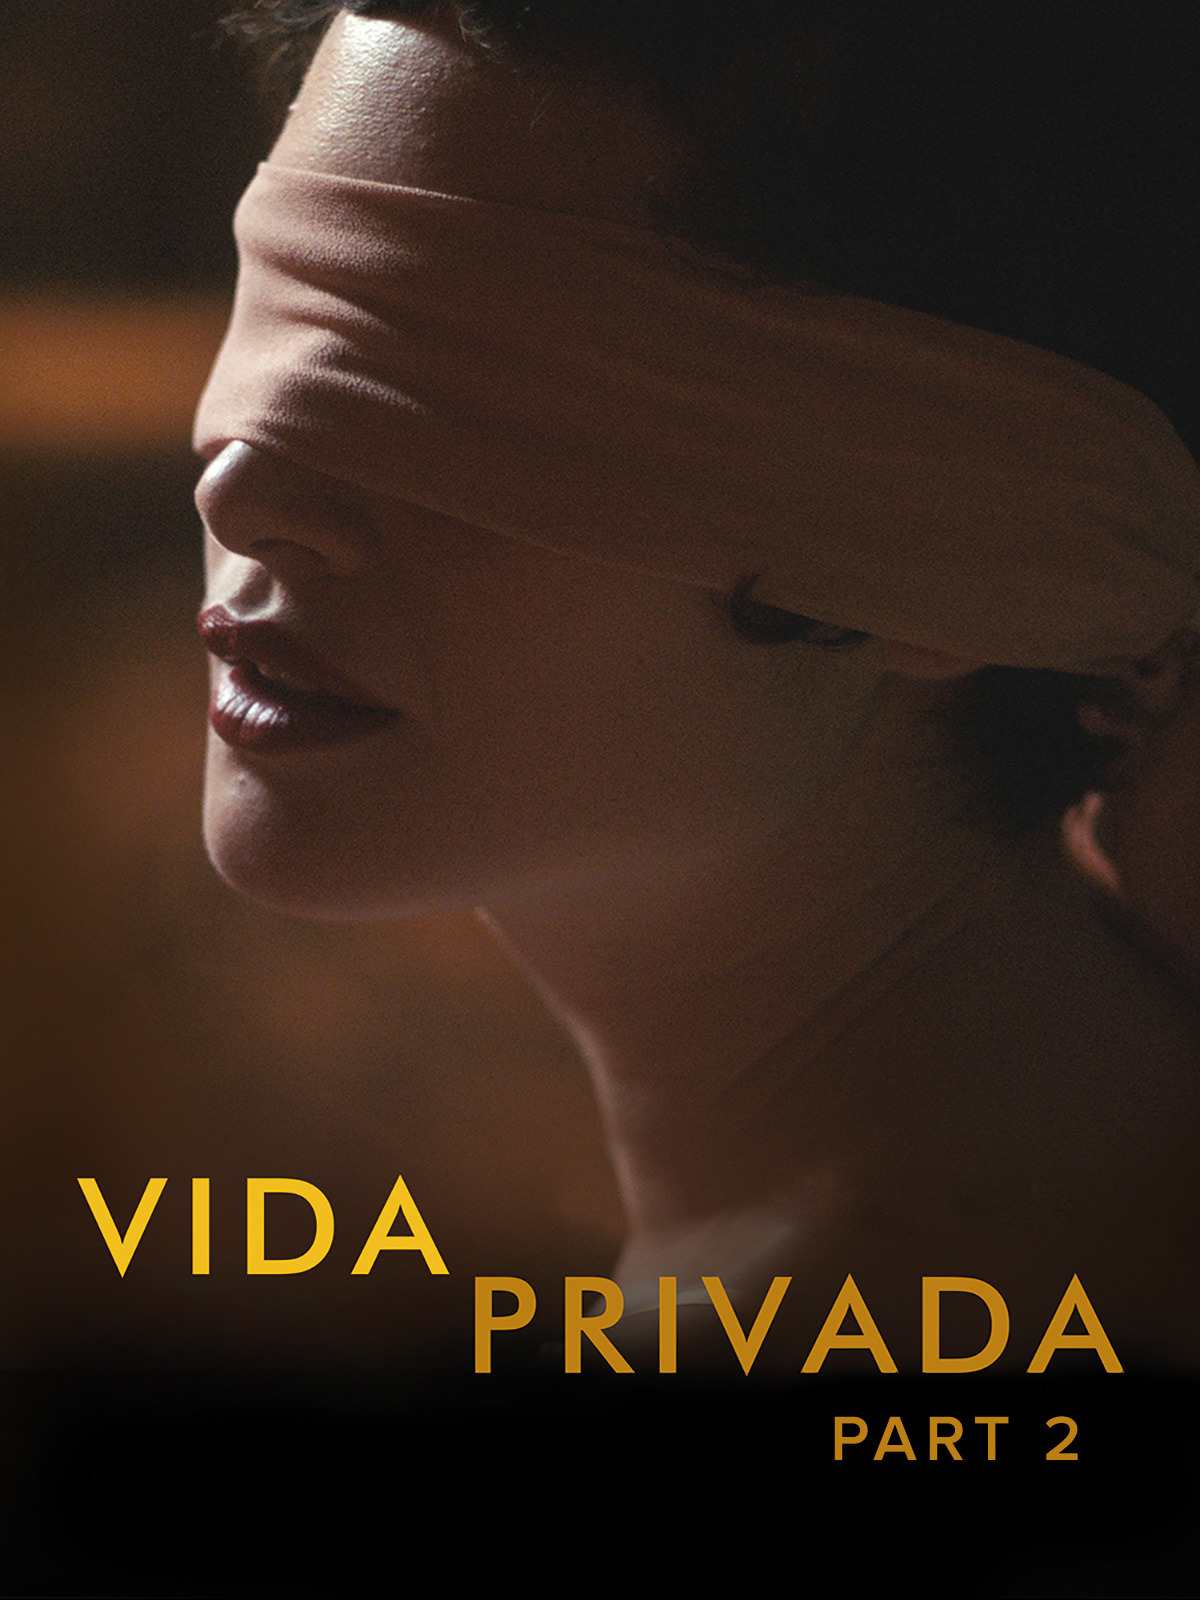 Vida privada - Part II [OV]